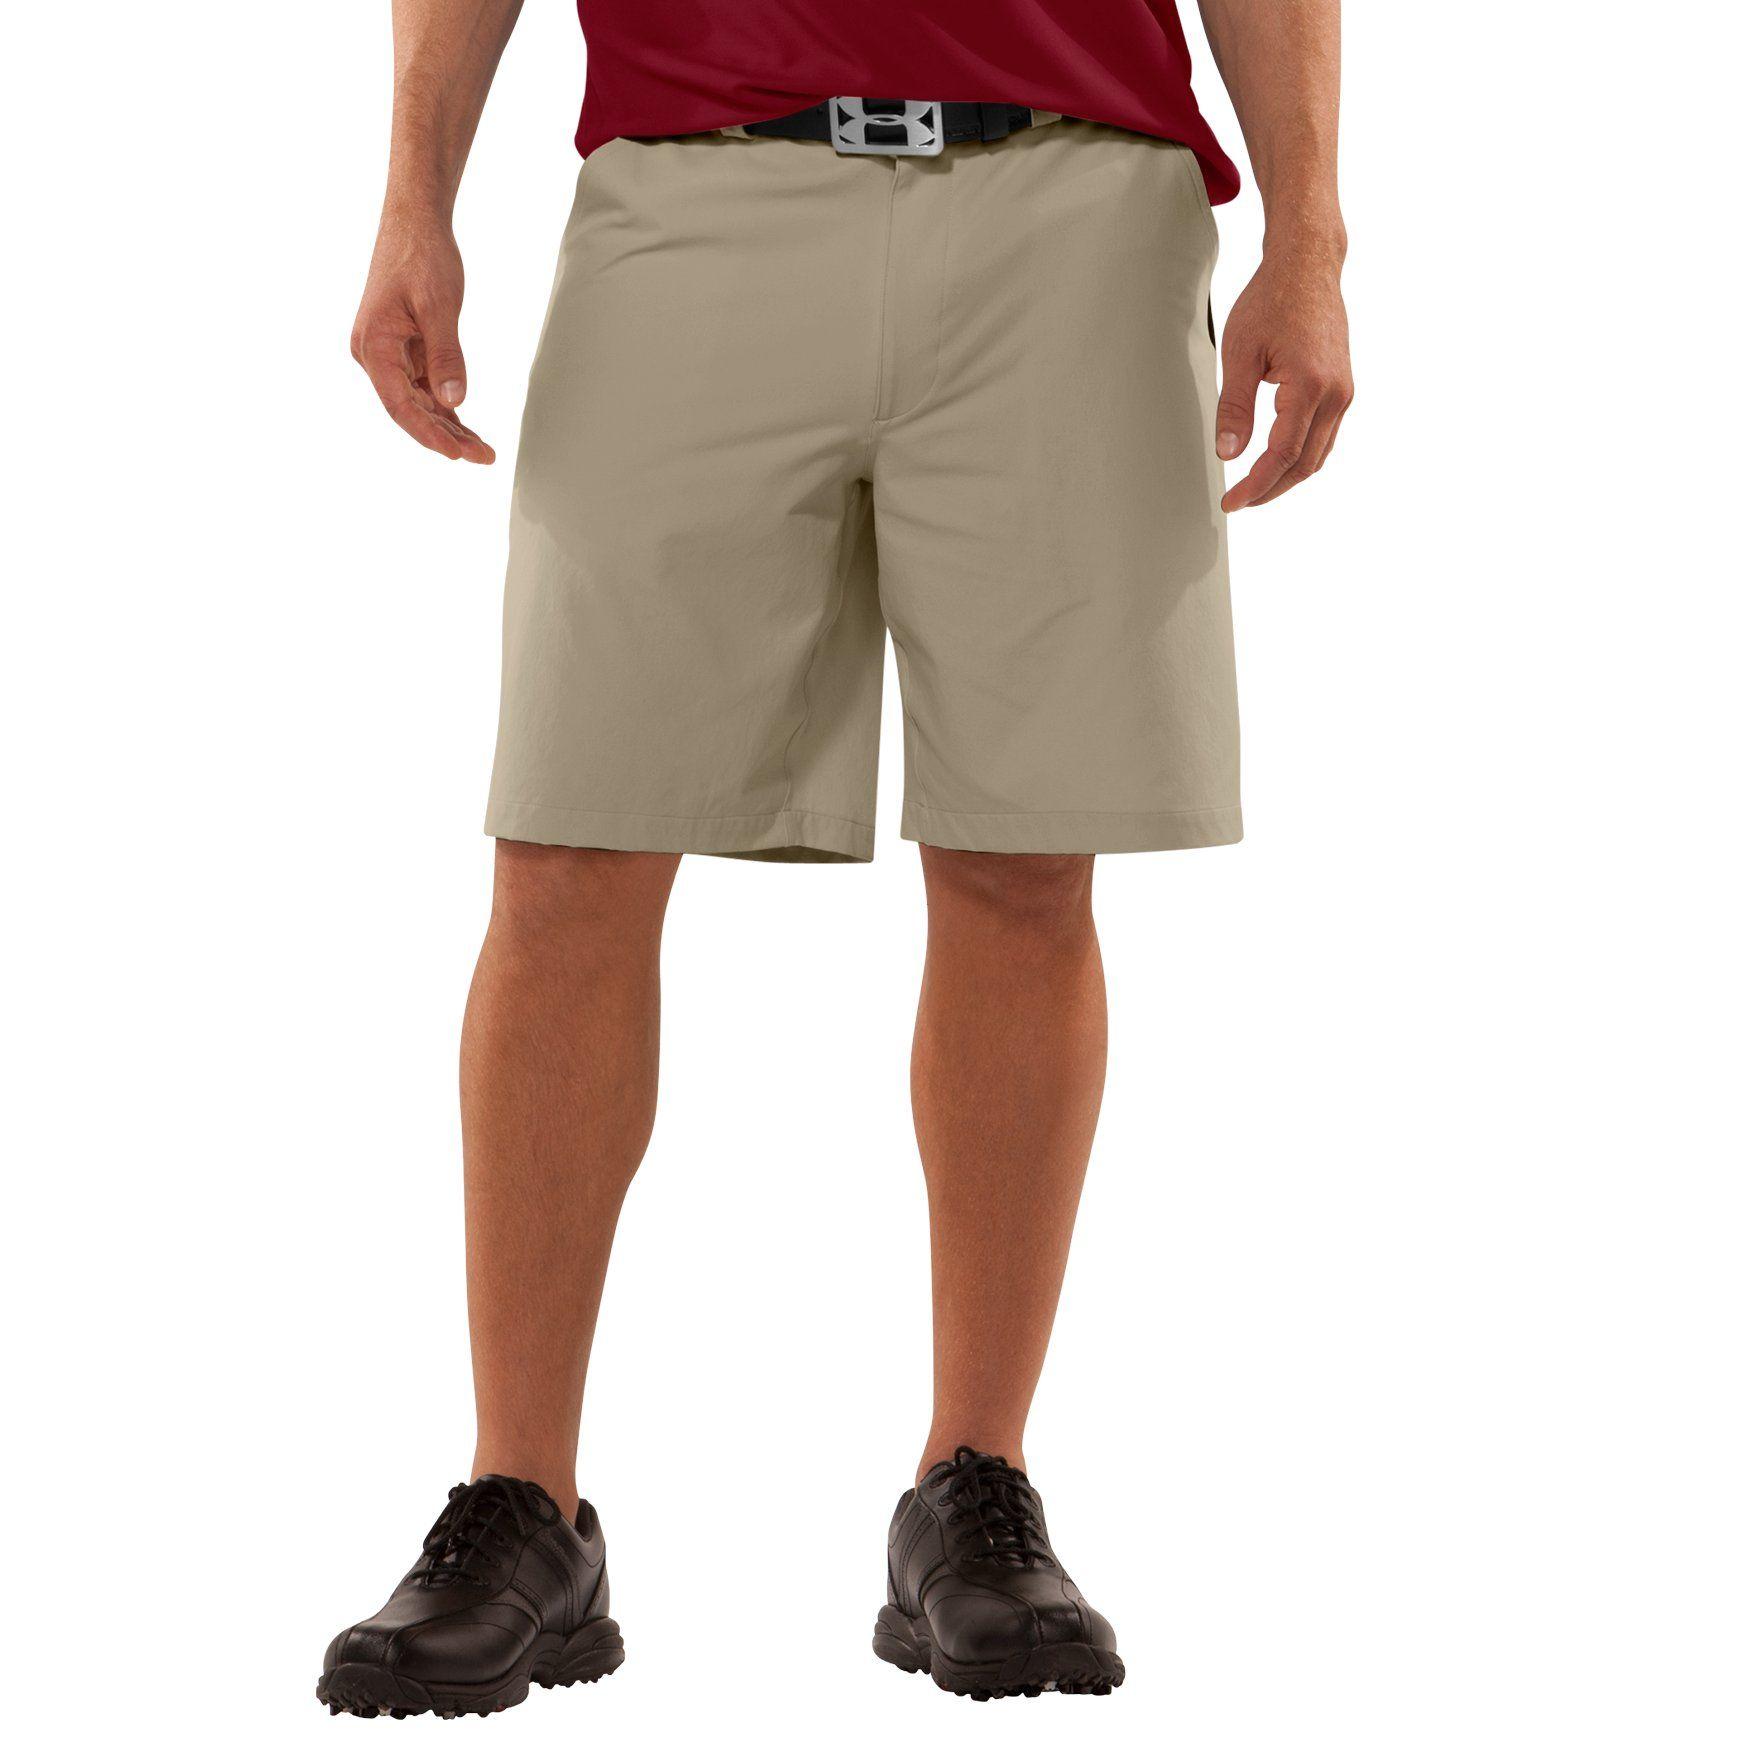 Herren Shorts Kleidung Shop : Herren Pullover Lebron Nike